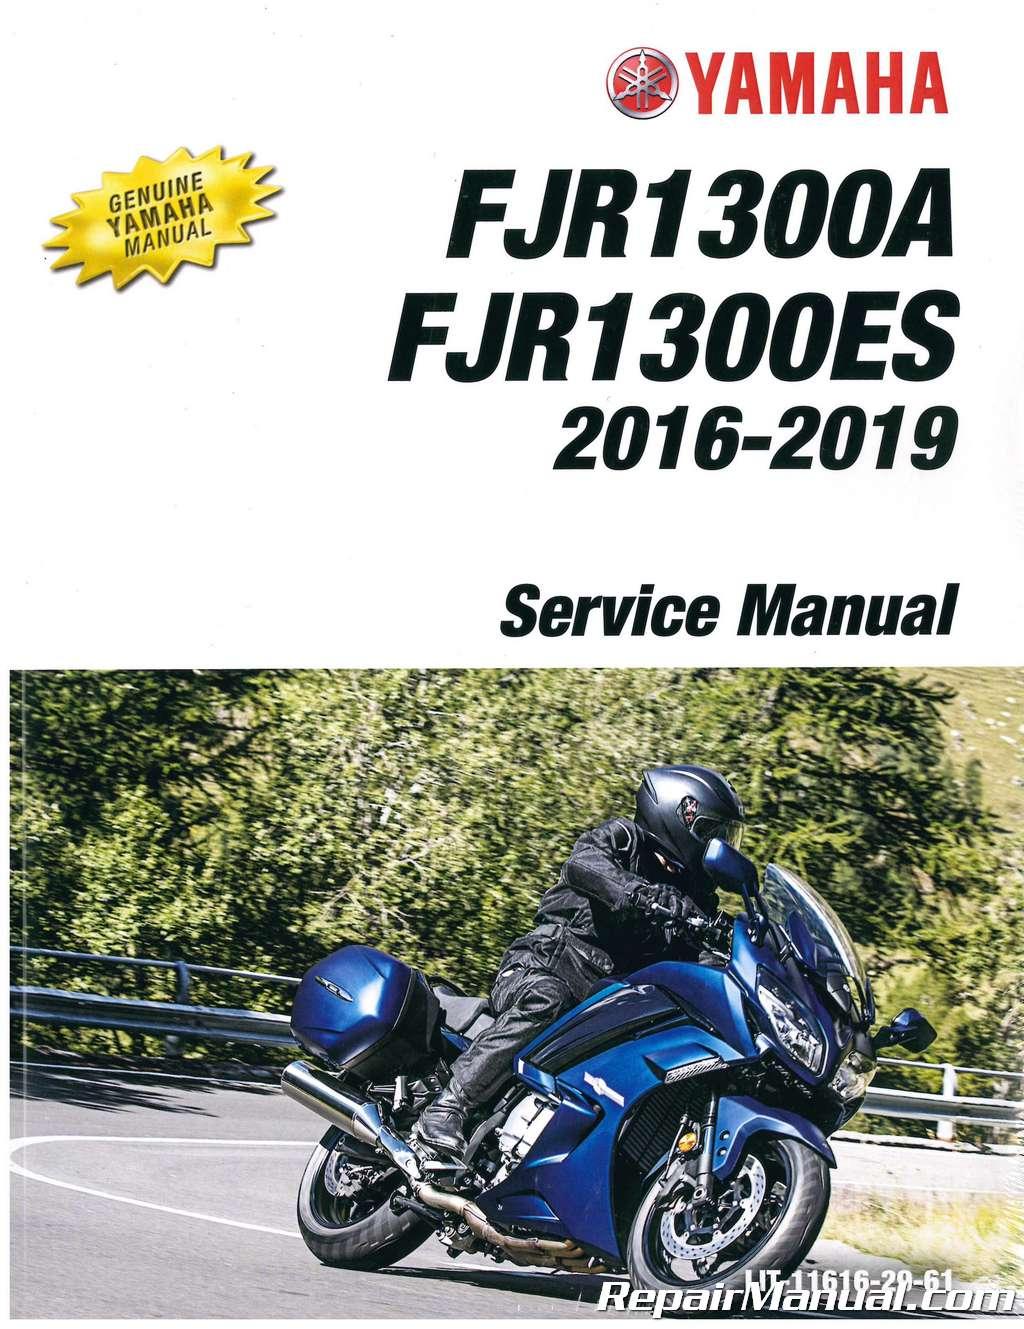 2016 2017 2018 yamaha fjr1300 fjr 1300 paper service manual 3-ring.